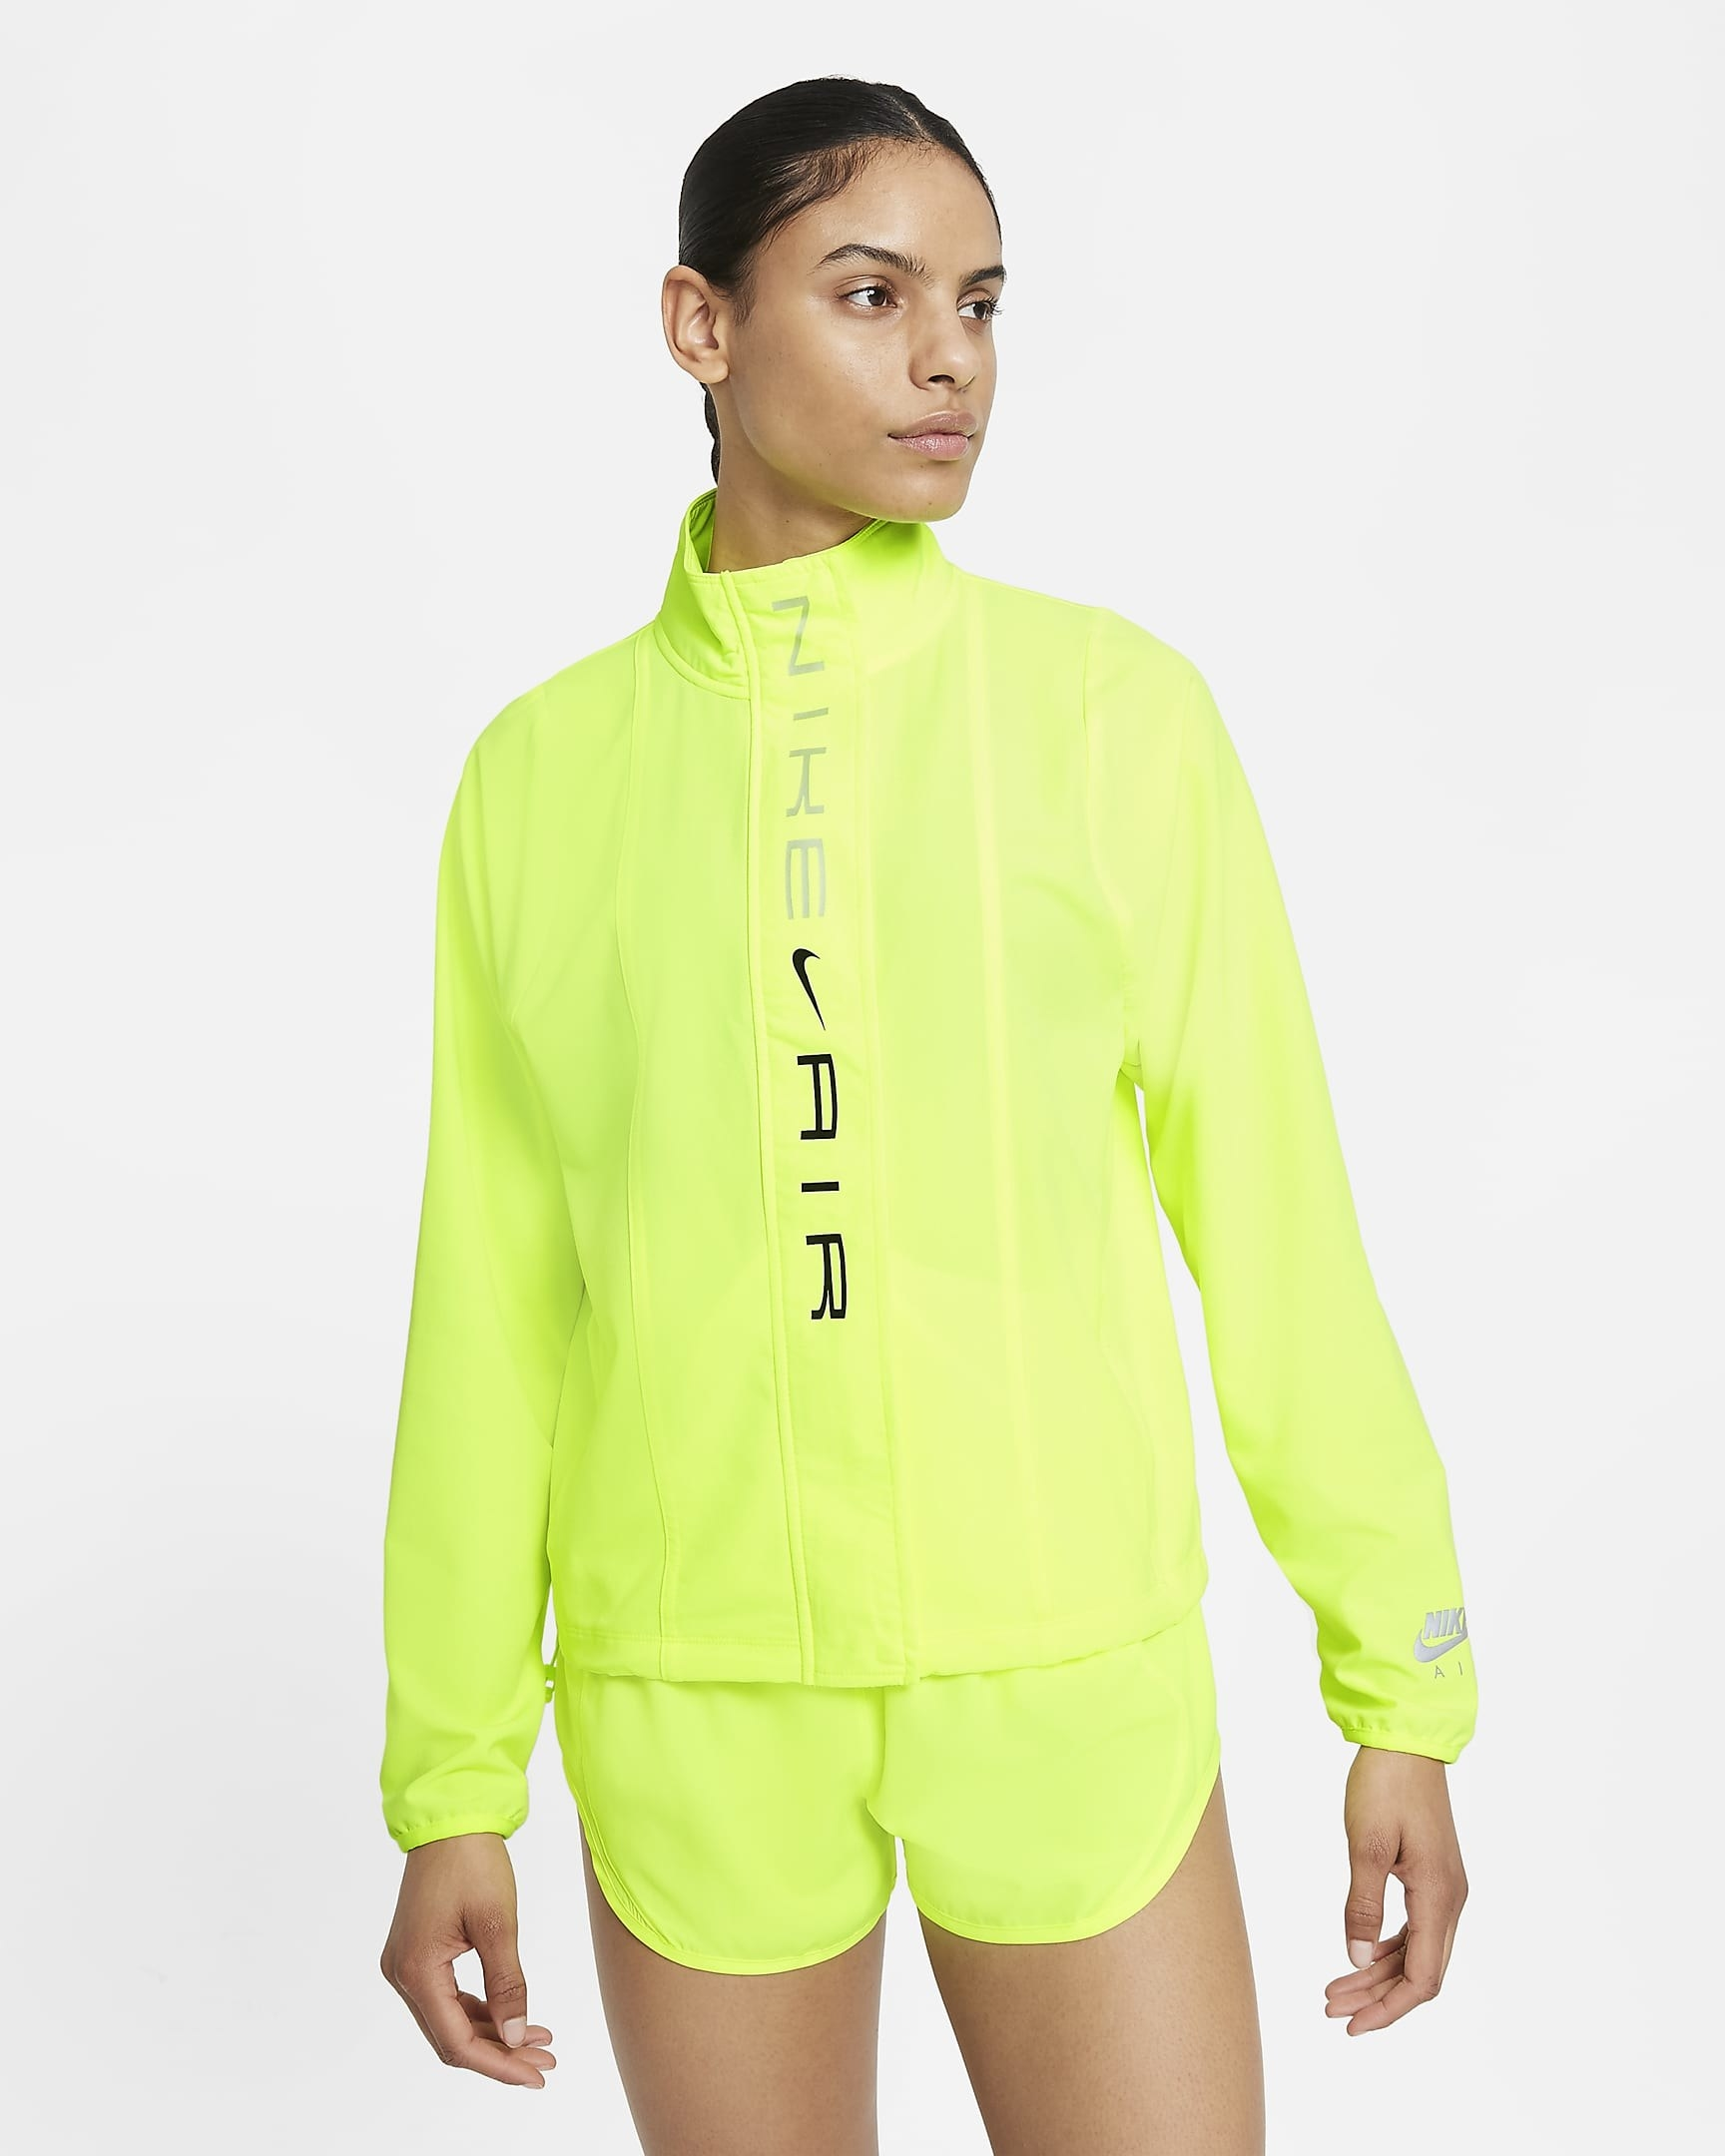 Model wearing neon yellow running jacket with matching shorts